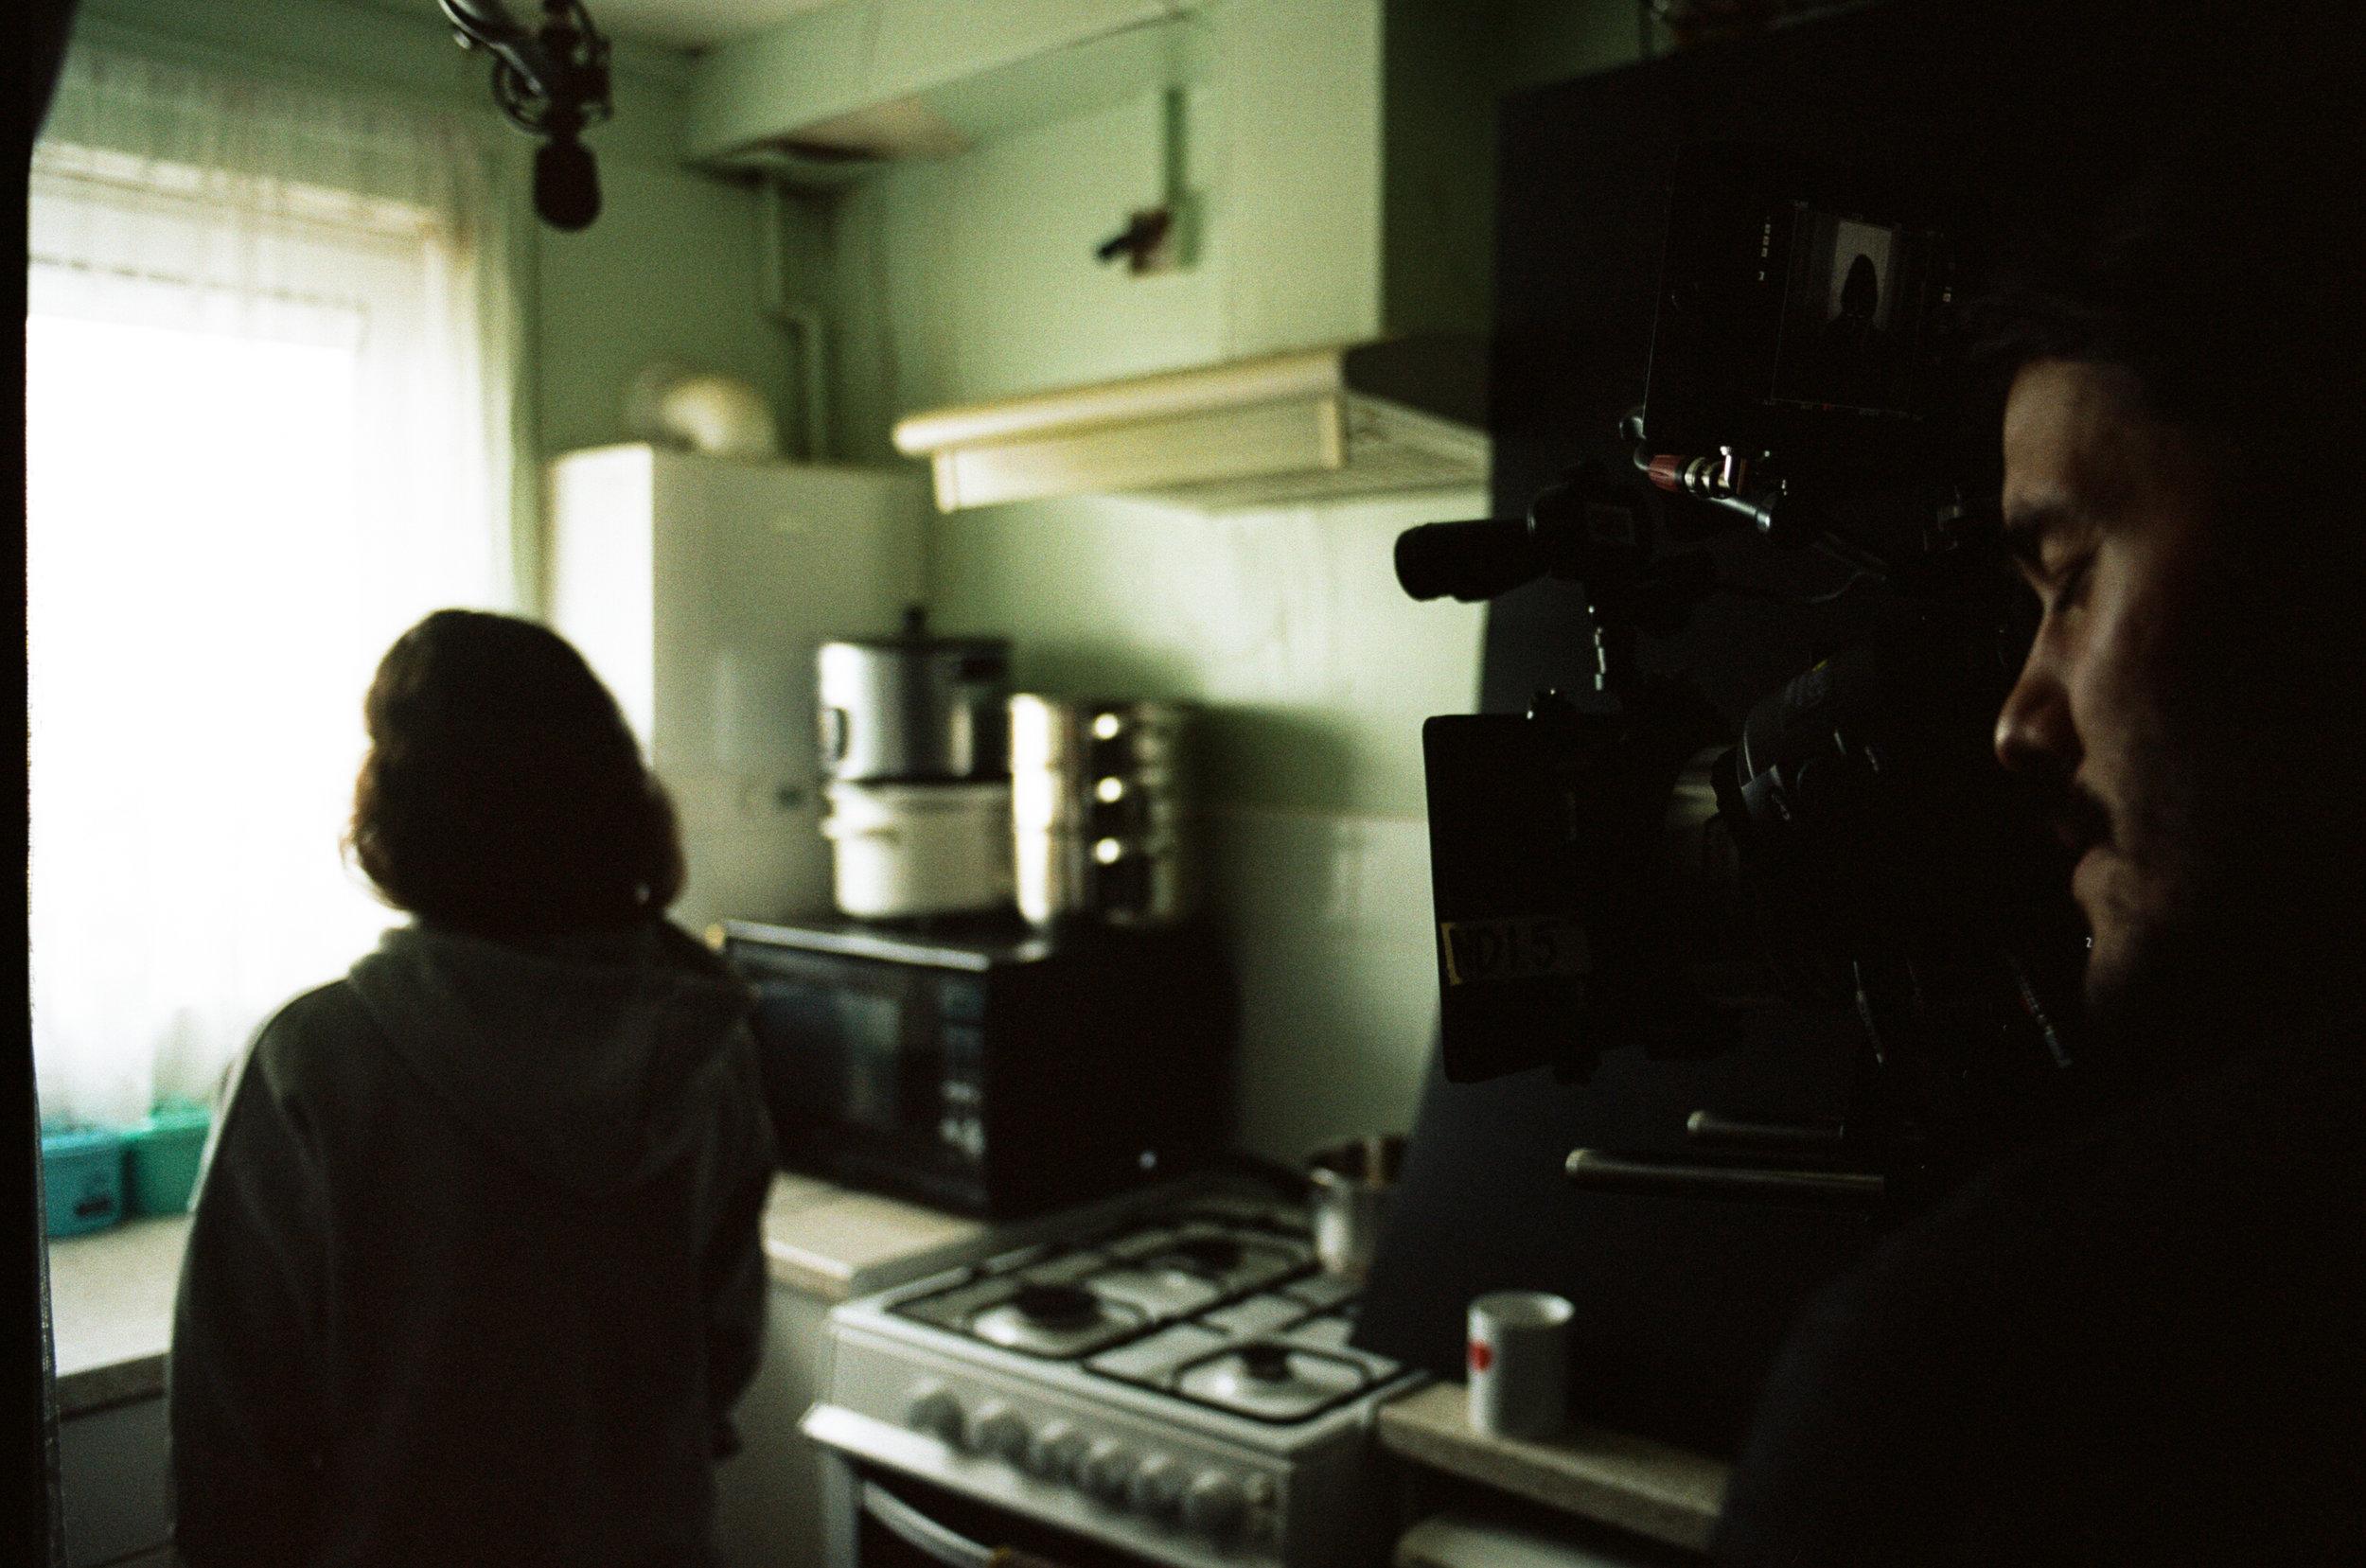 Film Artist working in the medium of celluloid film.